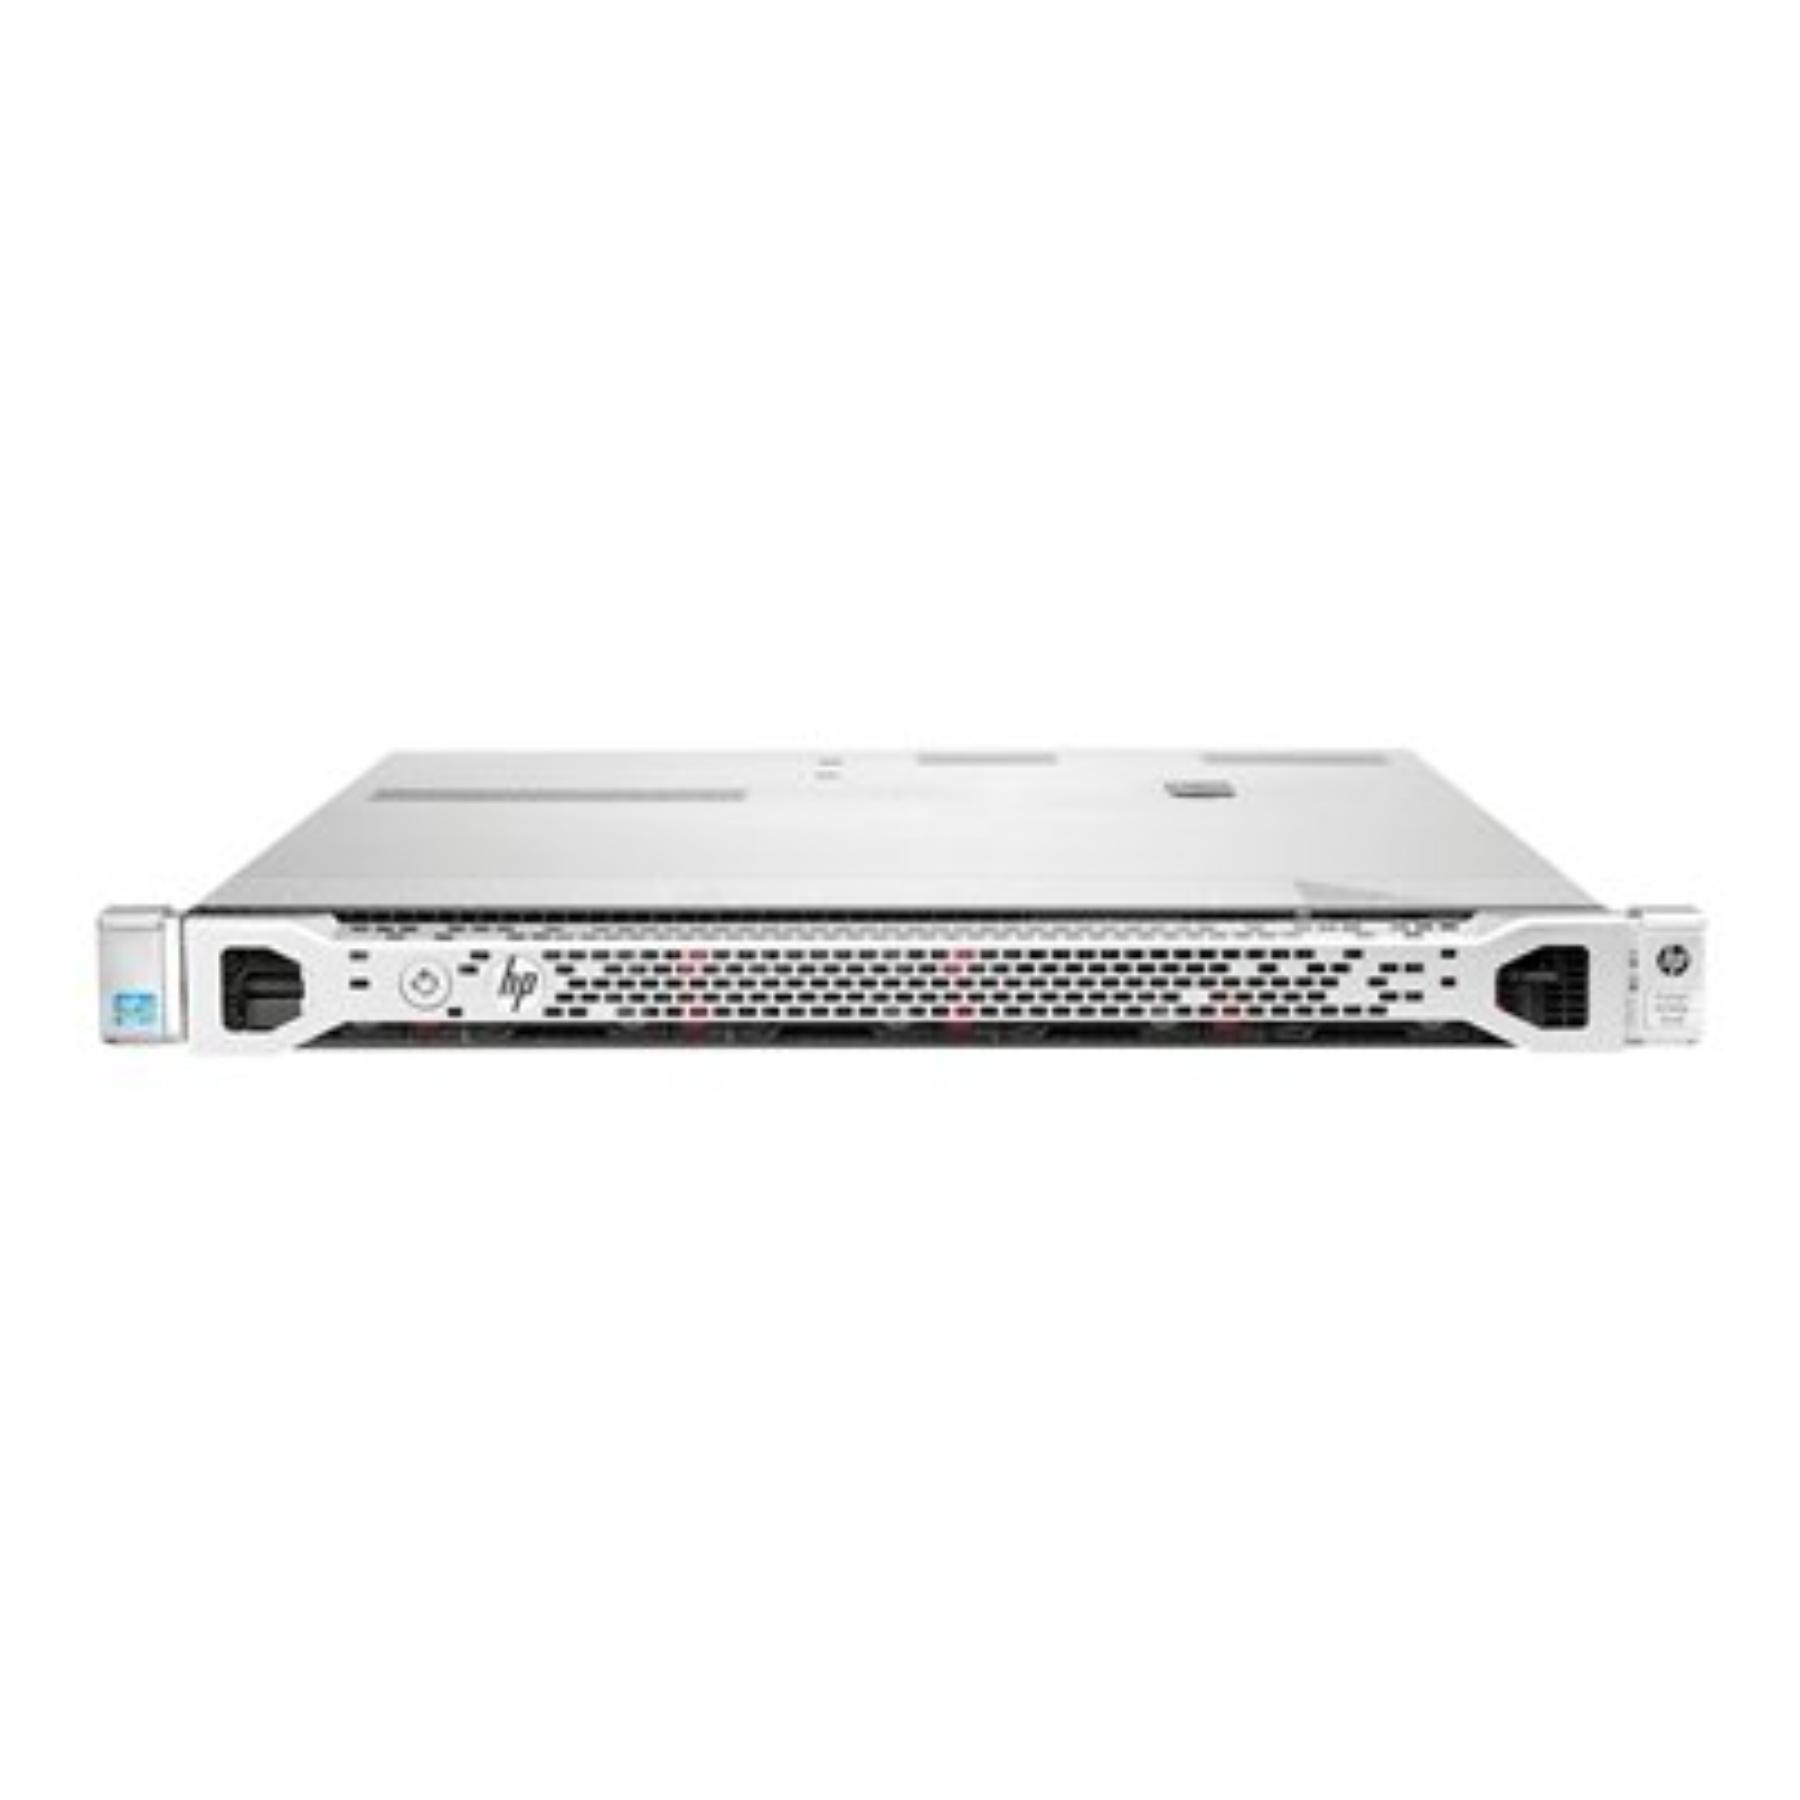 HPE 670852-S01 HP ProLiant DL380p Gen8 E5-2670 2.60GHz 8-core 2P 32GB-R P42